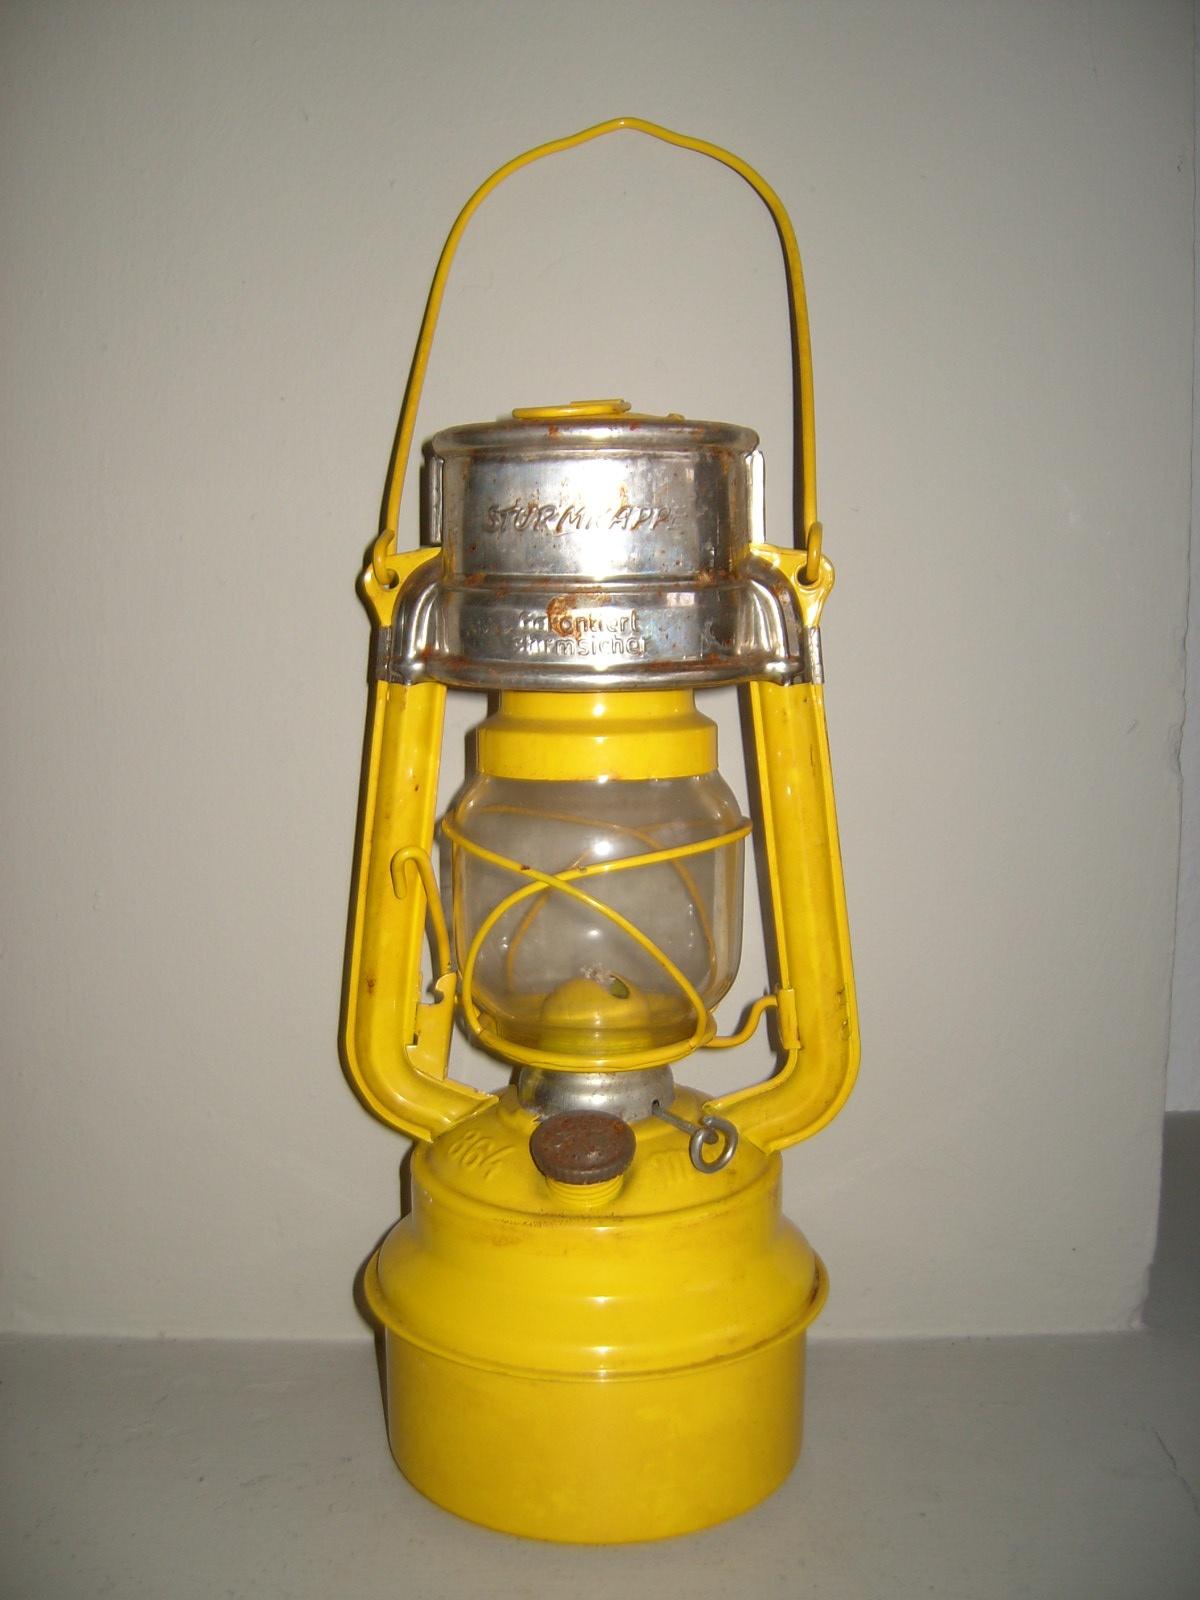 Gelb lackierte Sturmlaterne